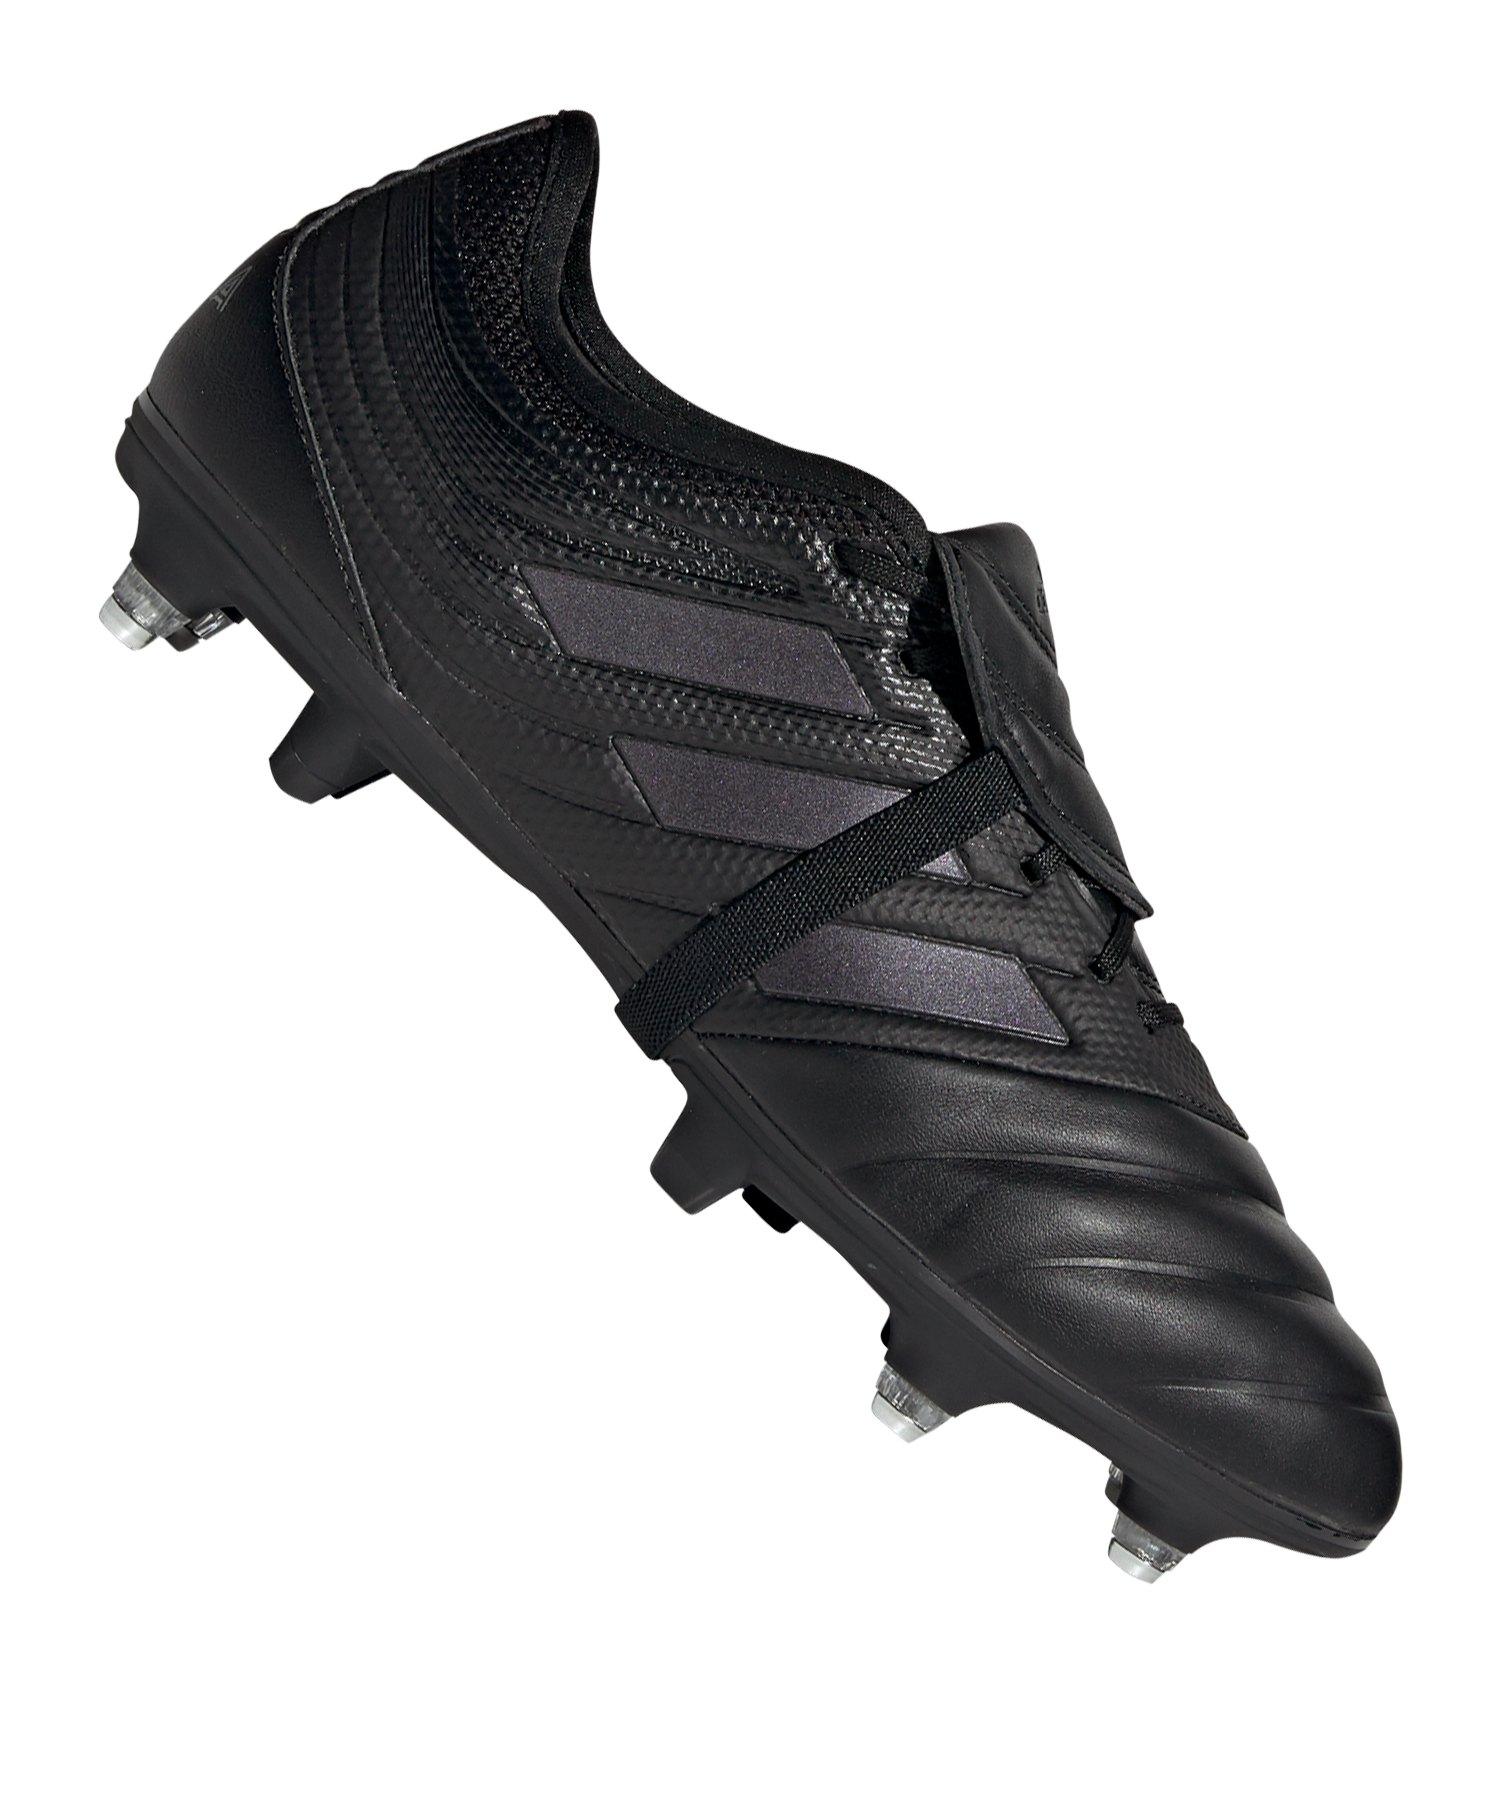 adidas COPA Gloro 19.2 SG Schwarz - schwarz